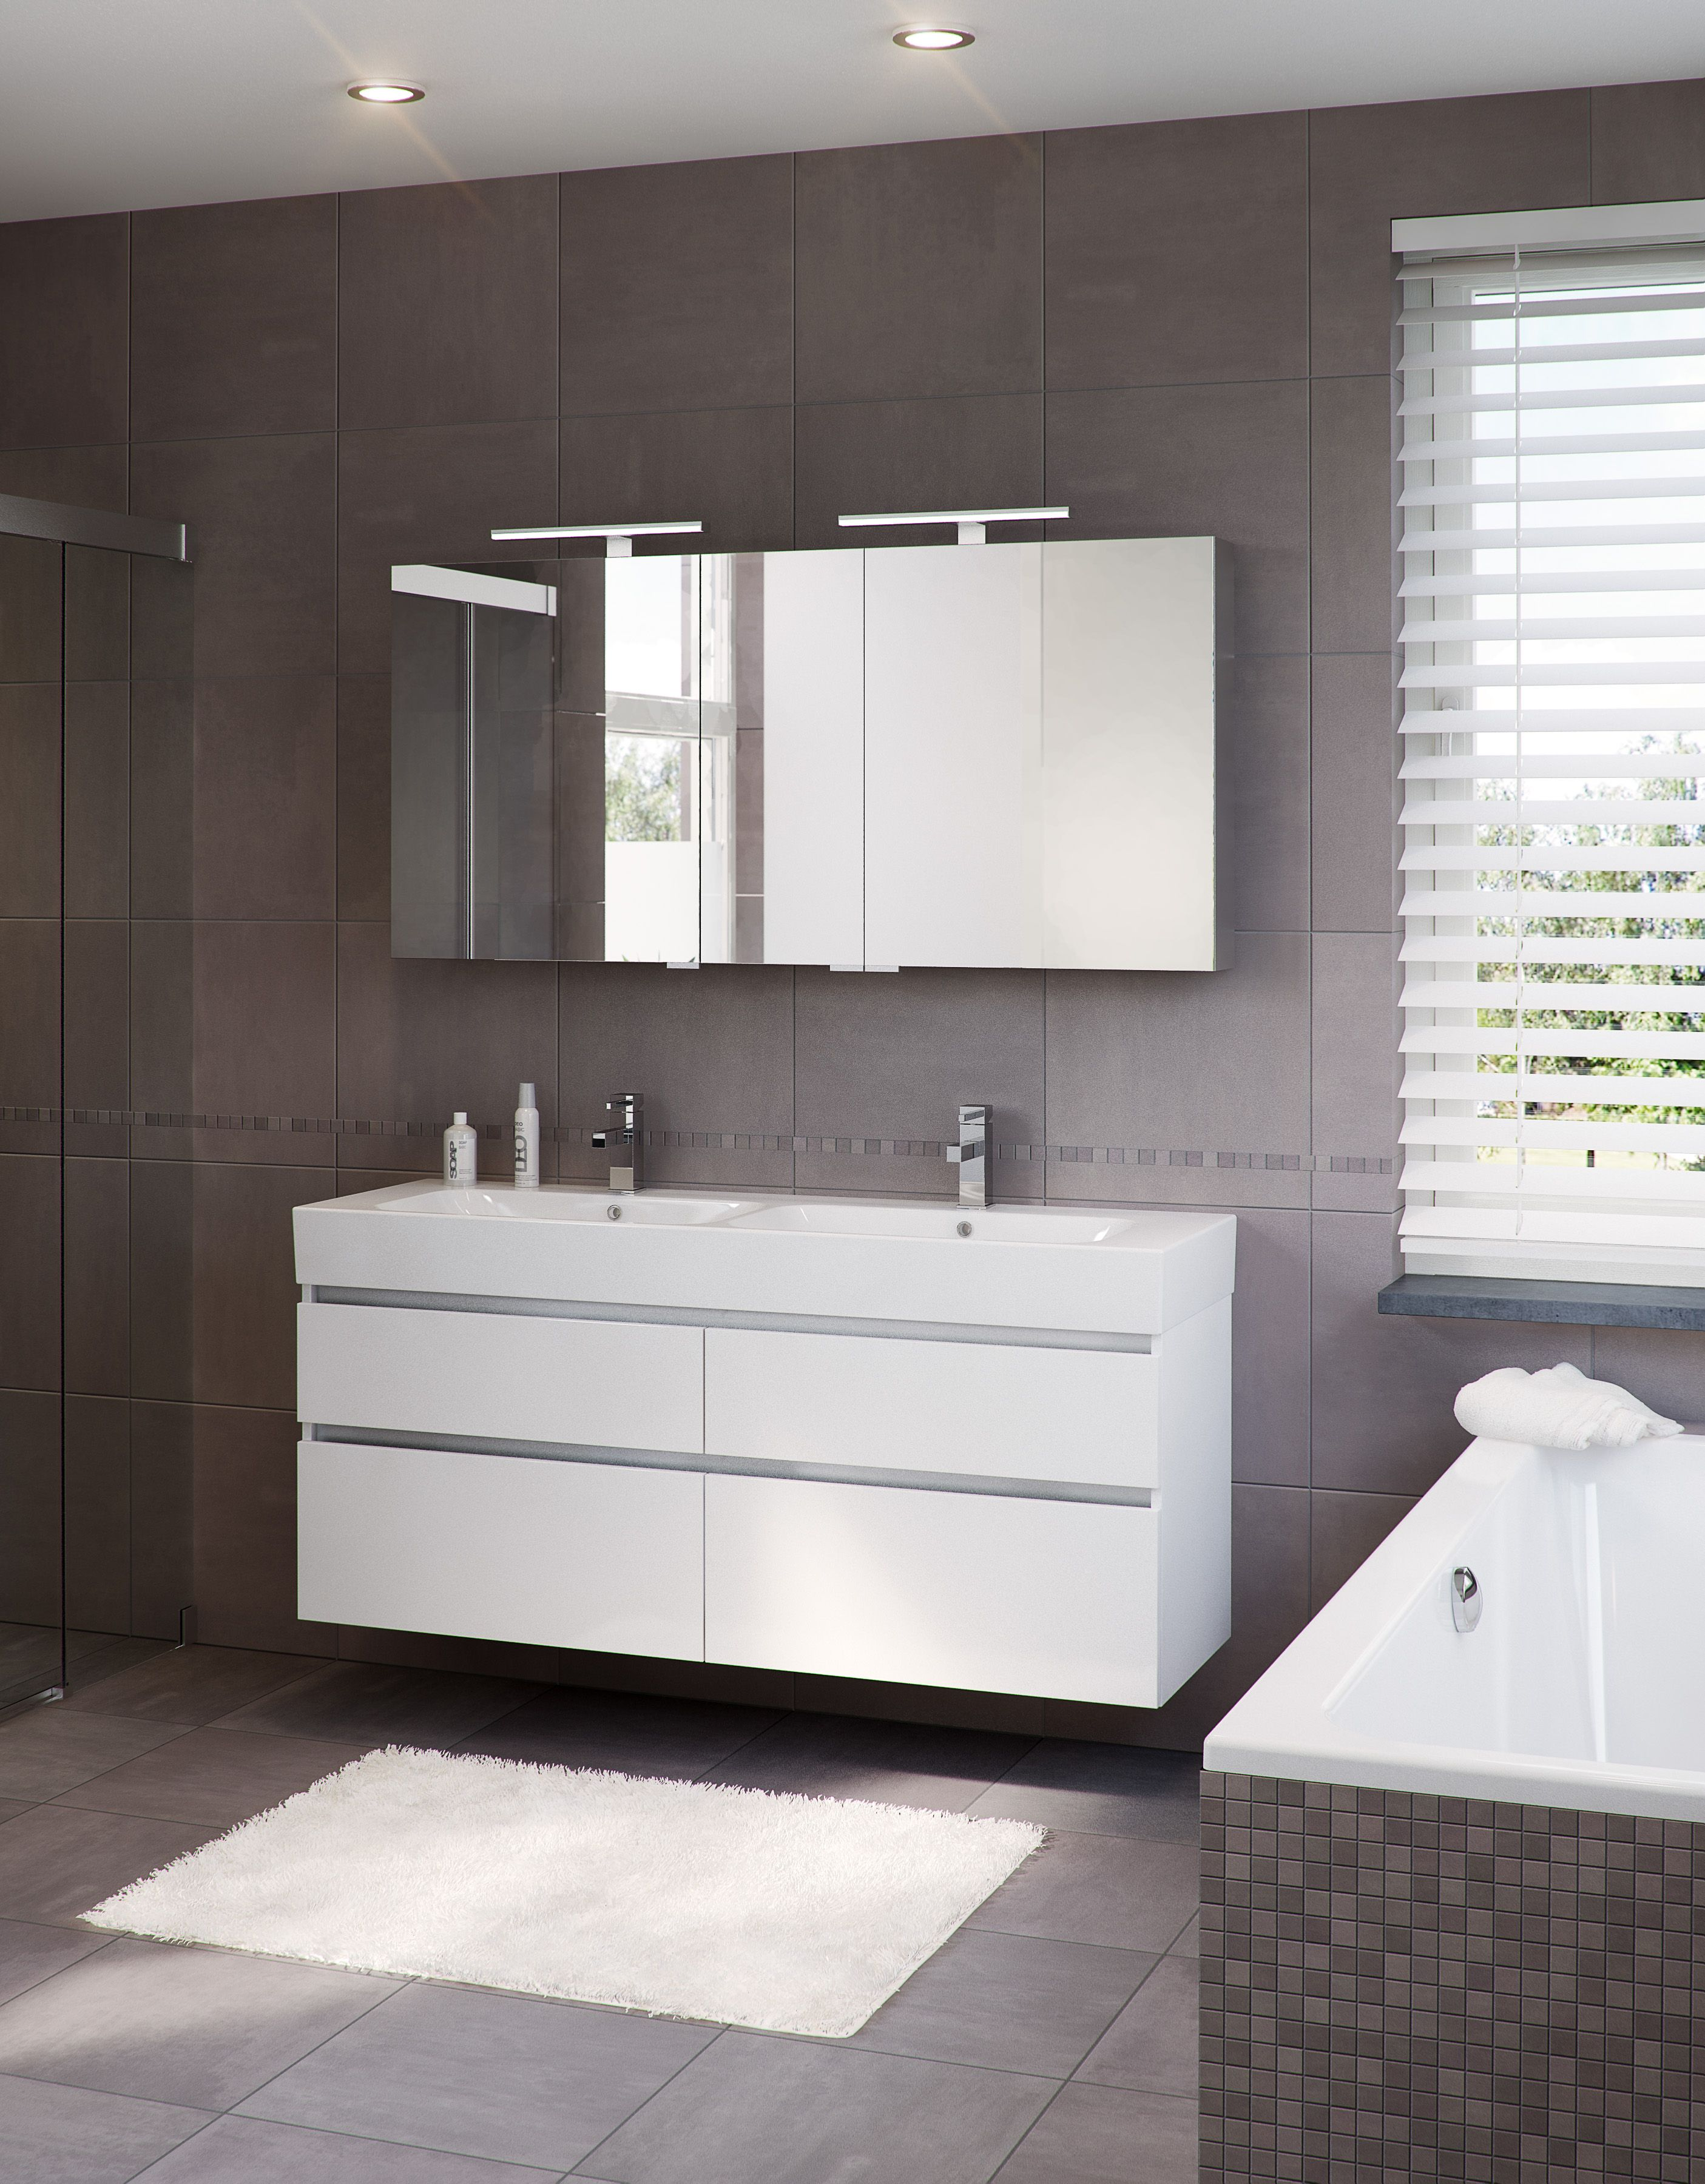 bruynzeel passo 120cm mat wit badmeubel badkamer sanitair